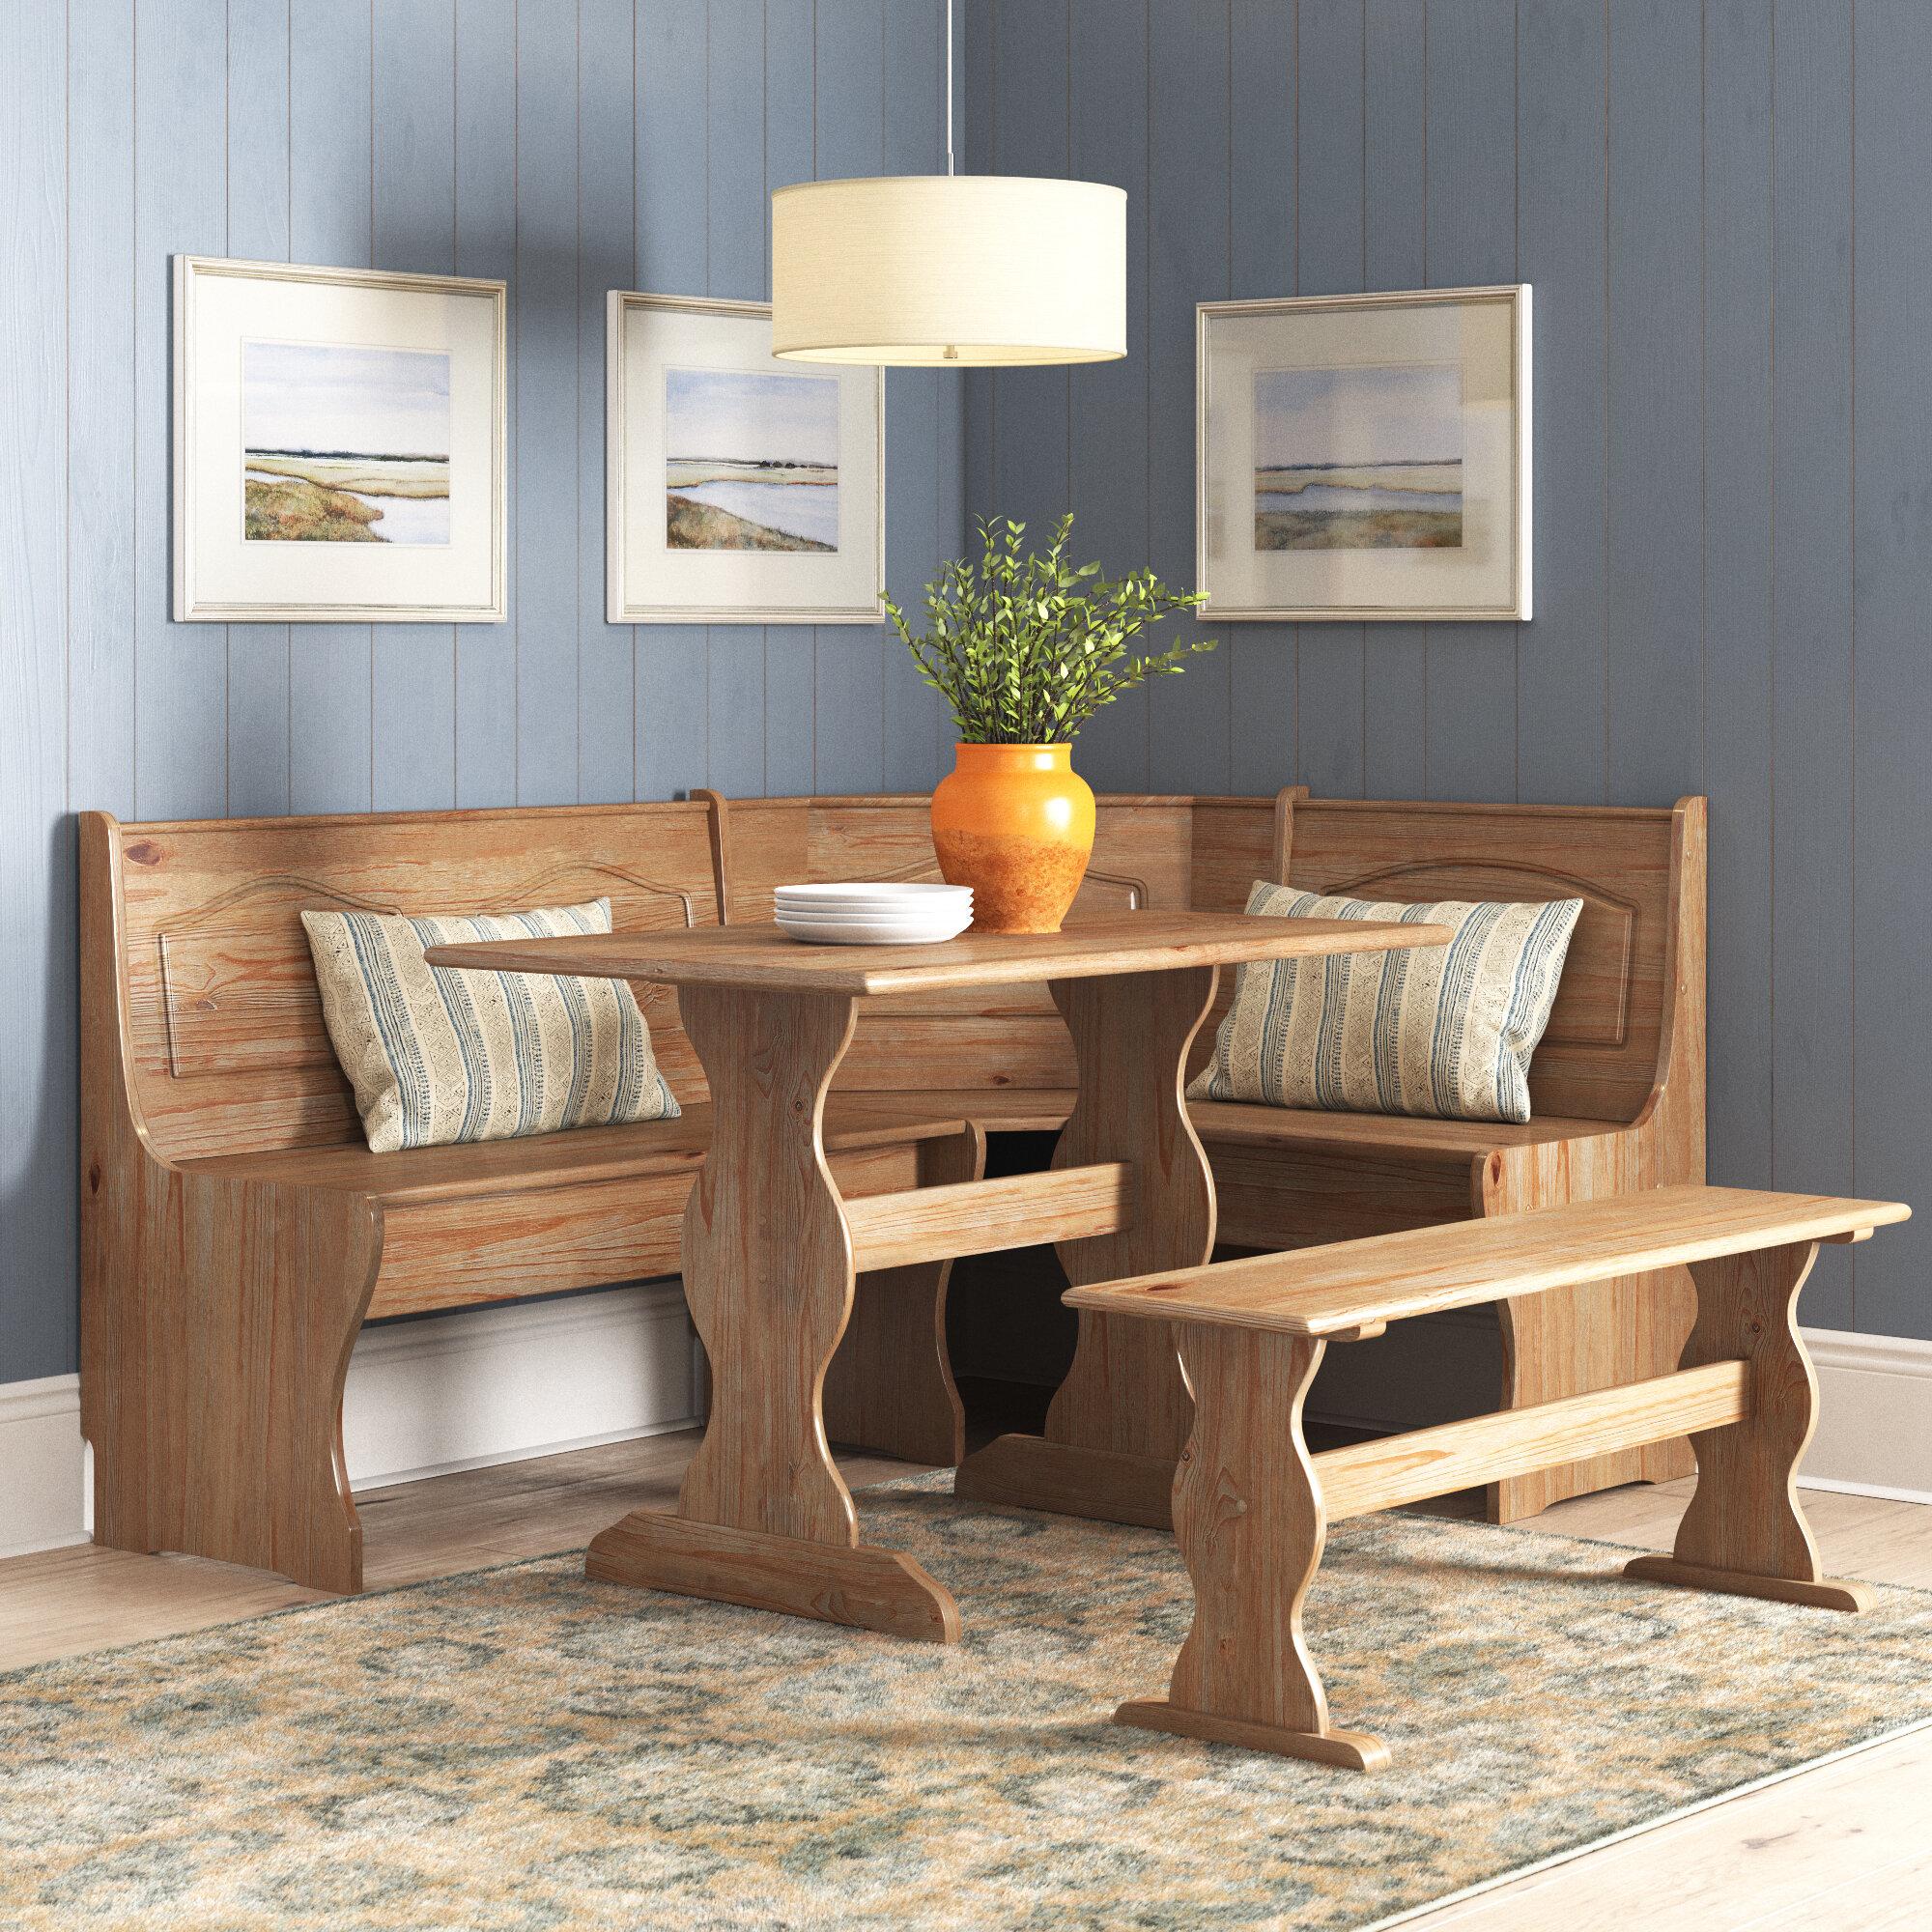 August Grove® Padstow 3 - Piece Pine Solid Wood Breakfast Nook